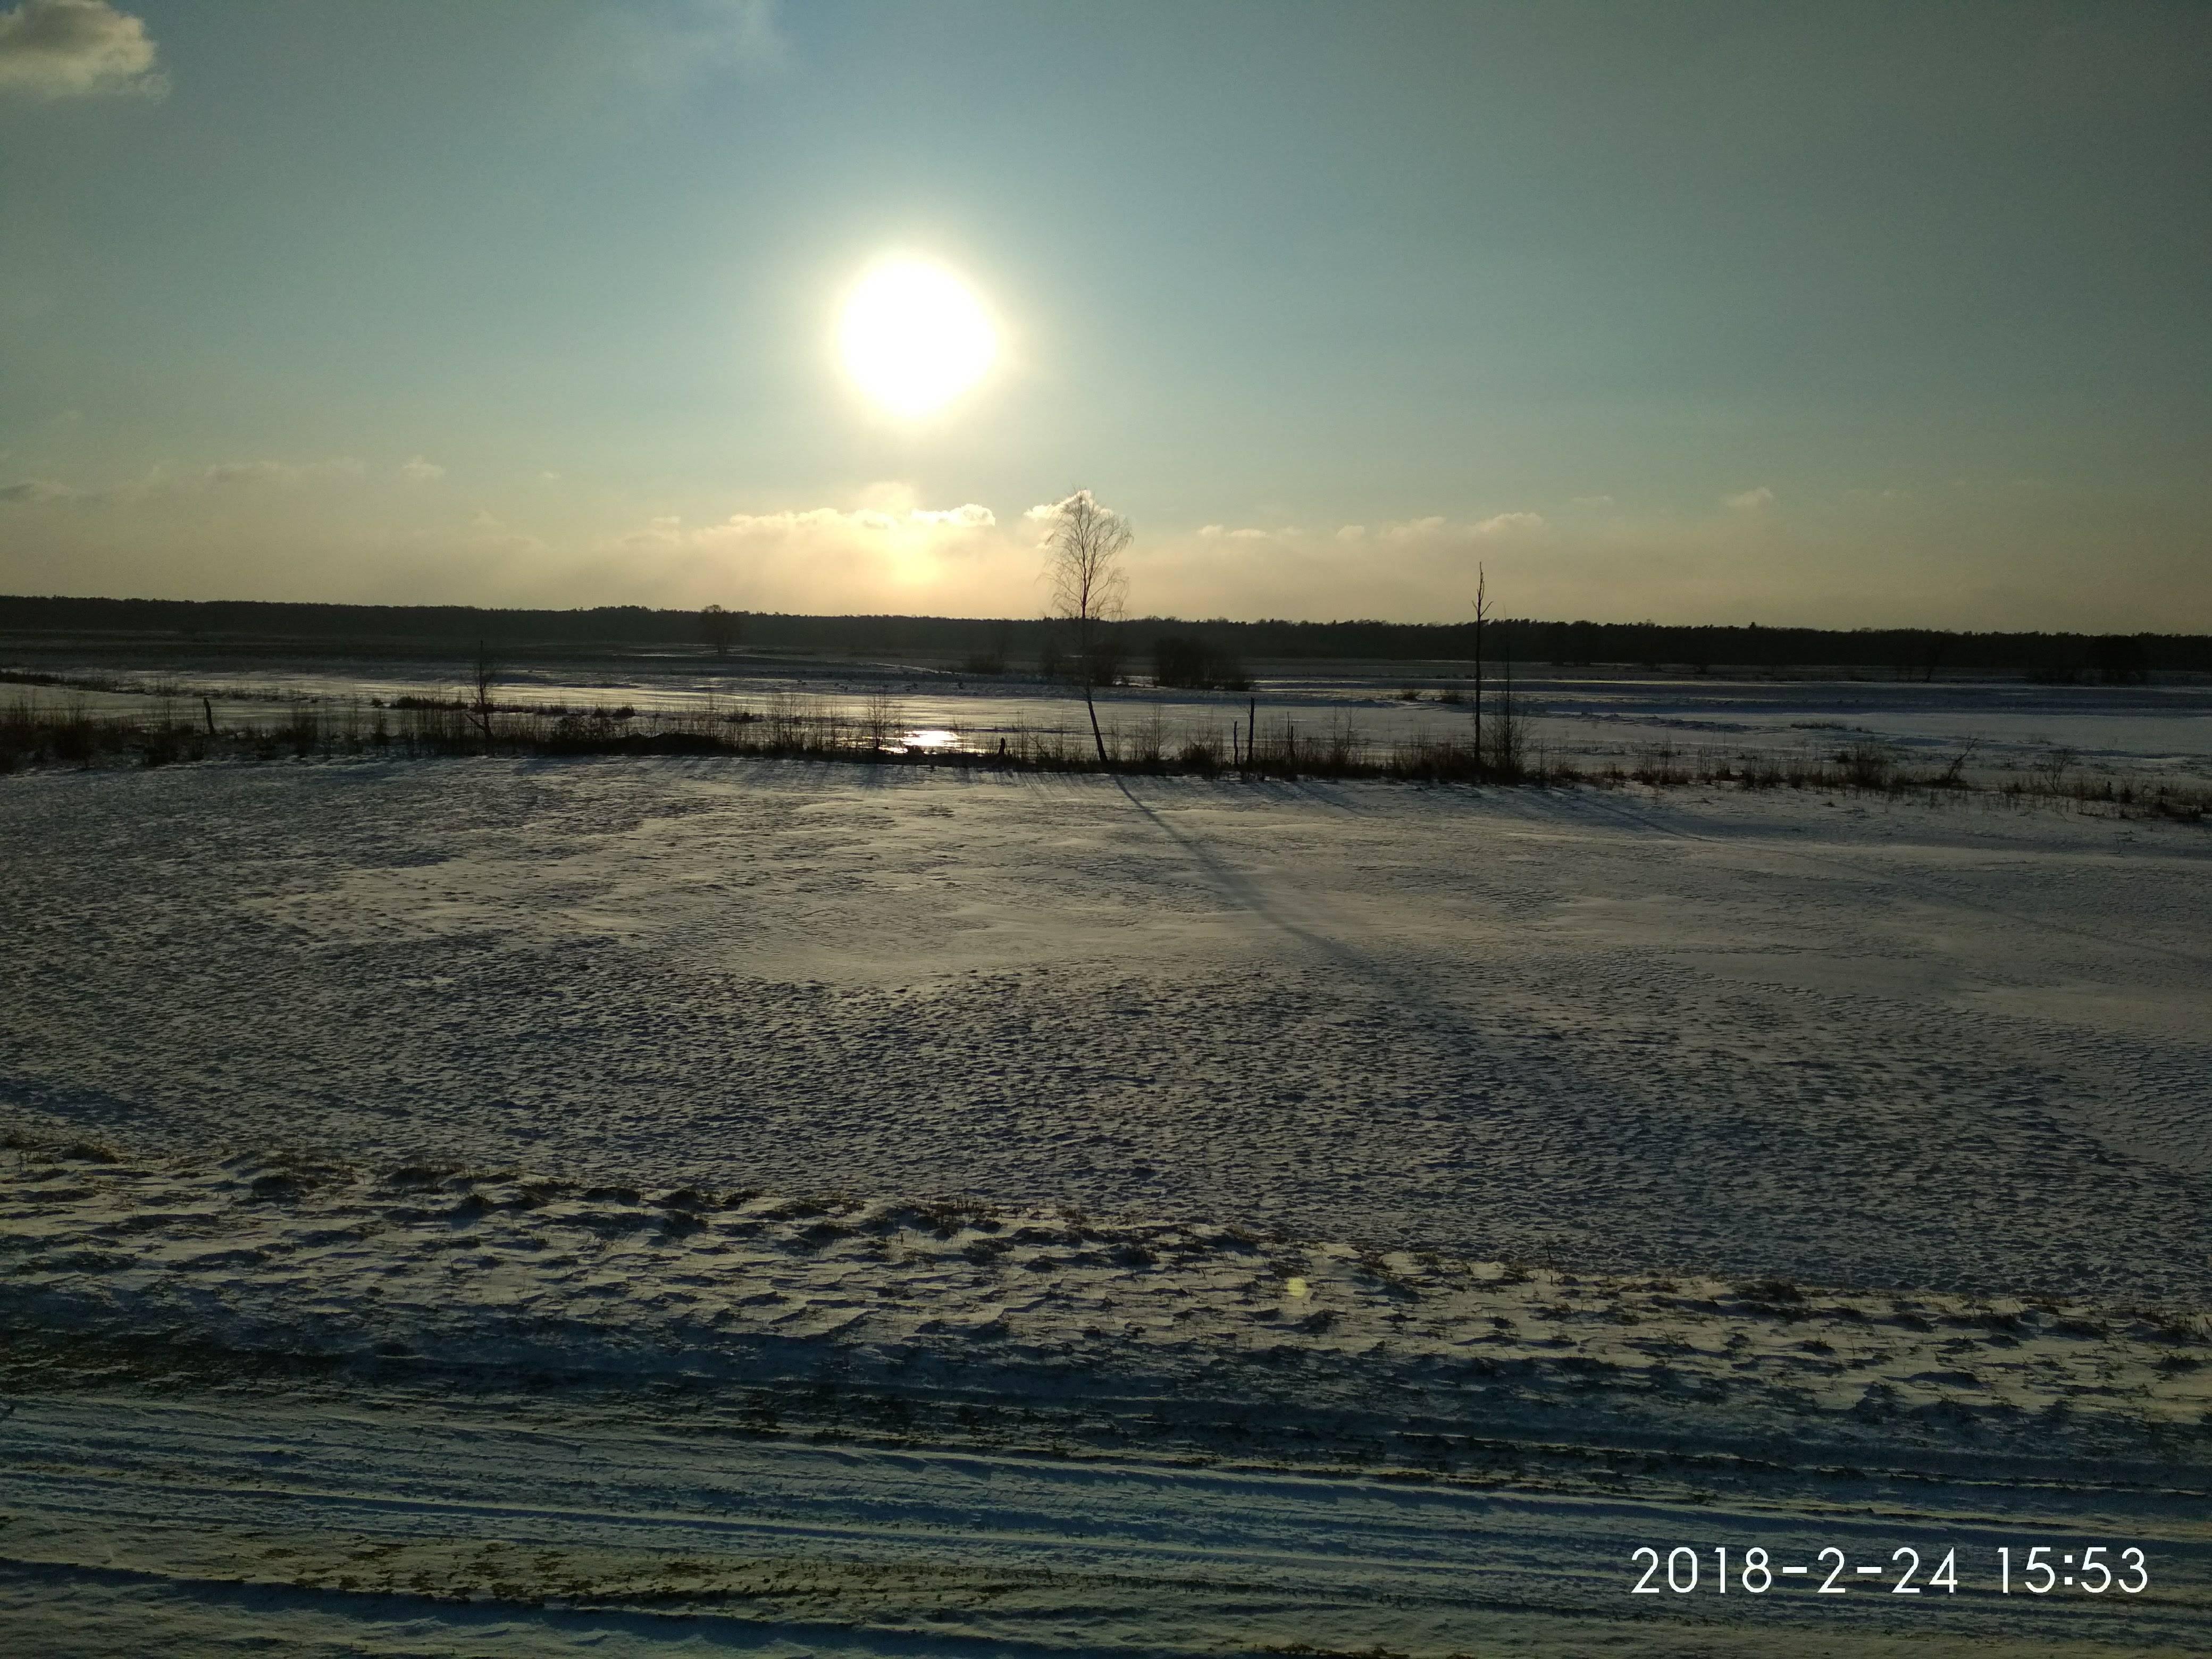 npk kiełpiniec zachód słońca